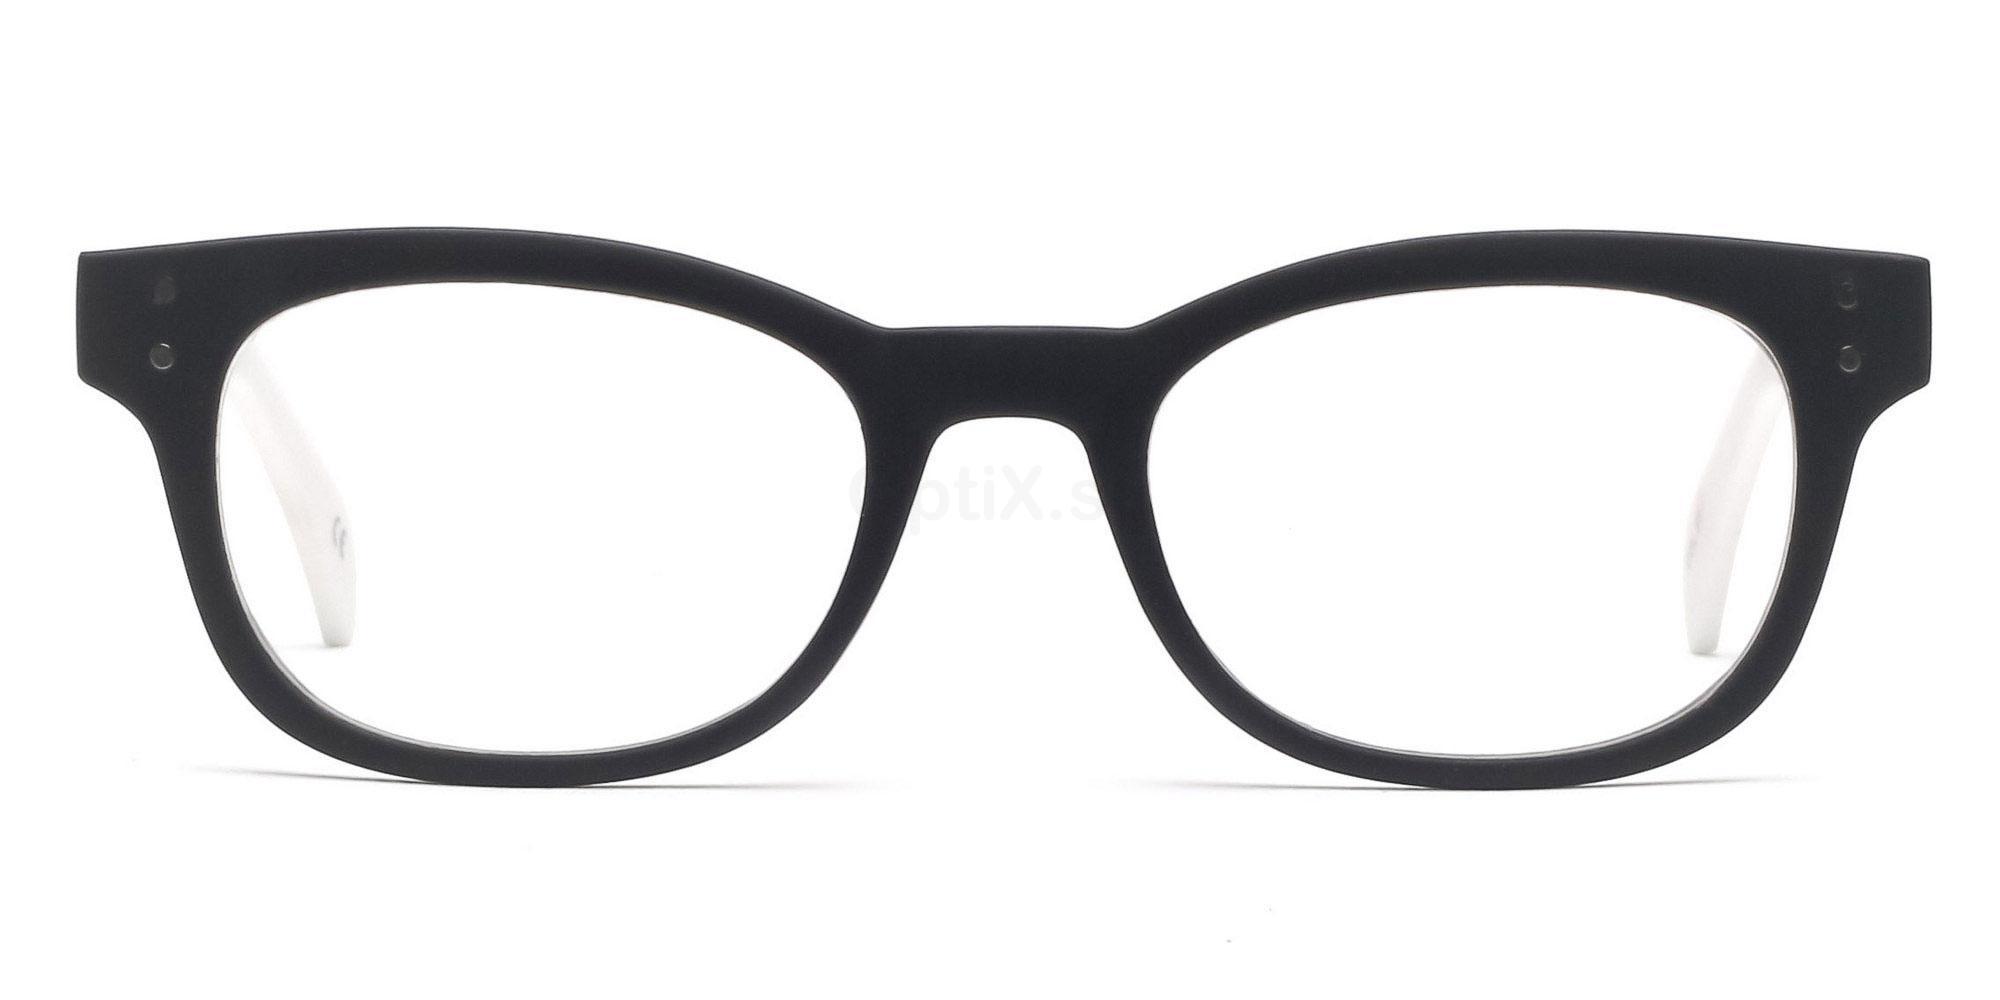 C91 2249 - Matte White Glasses, Savannah